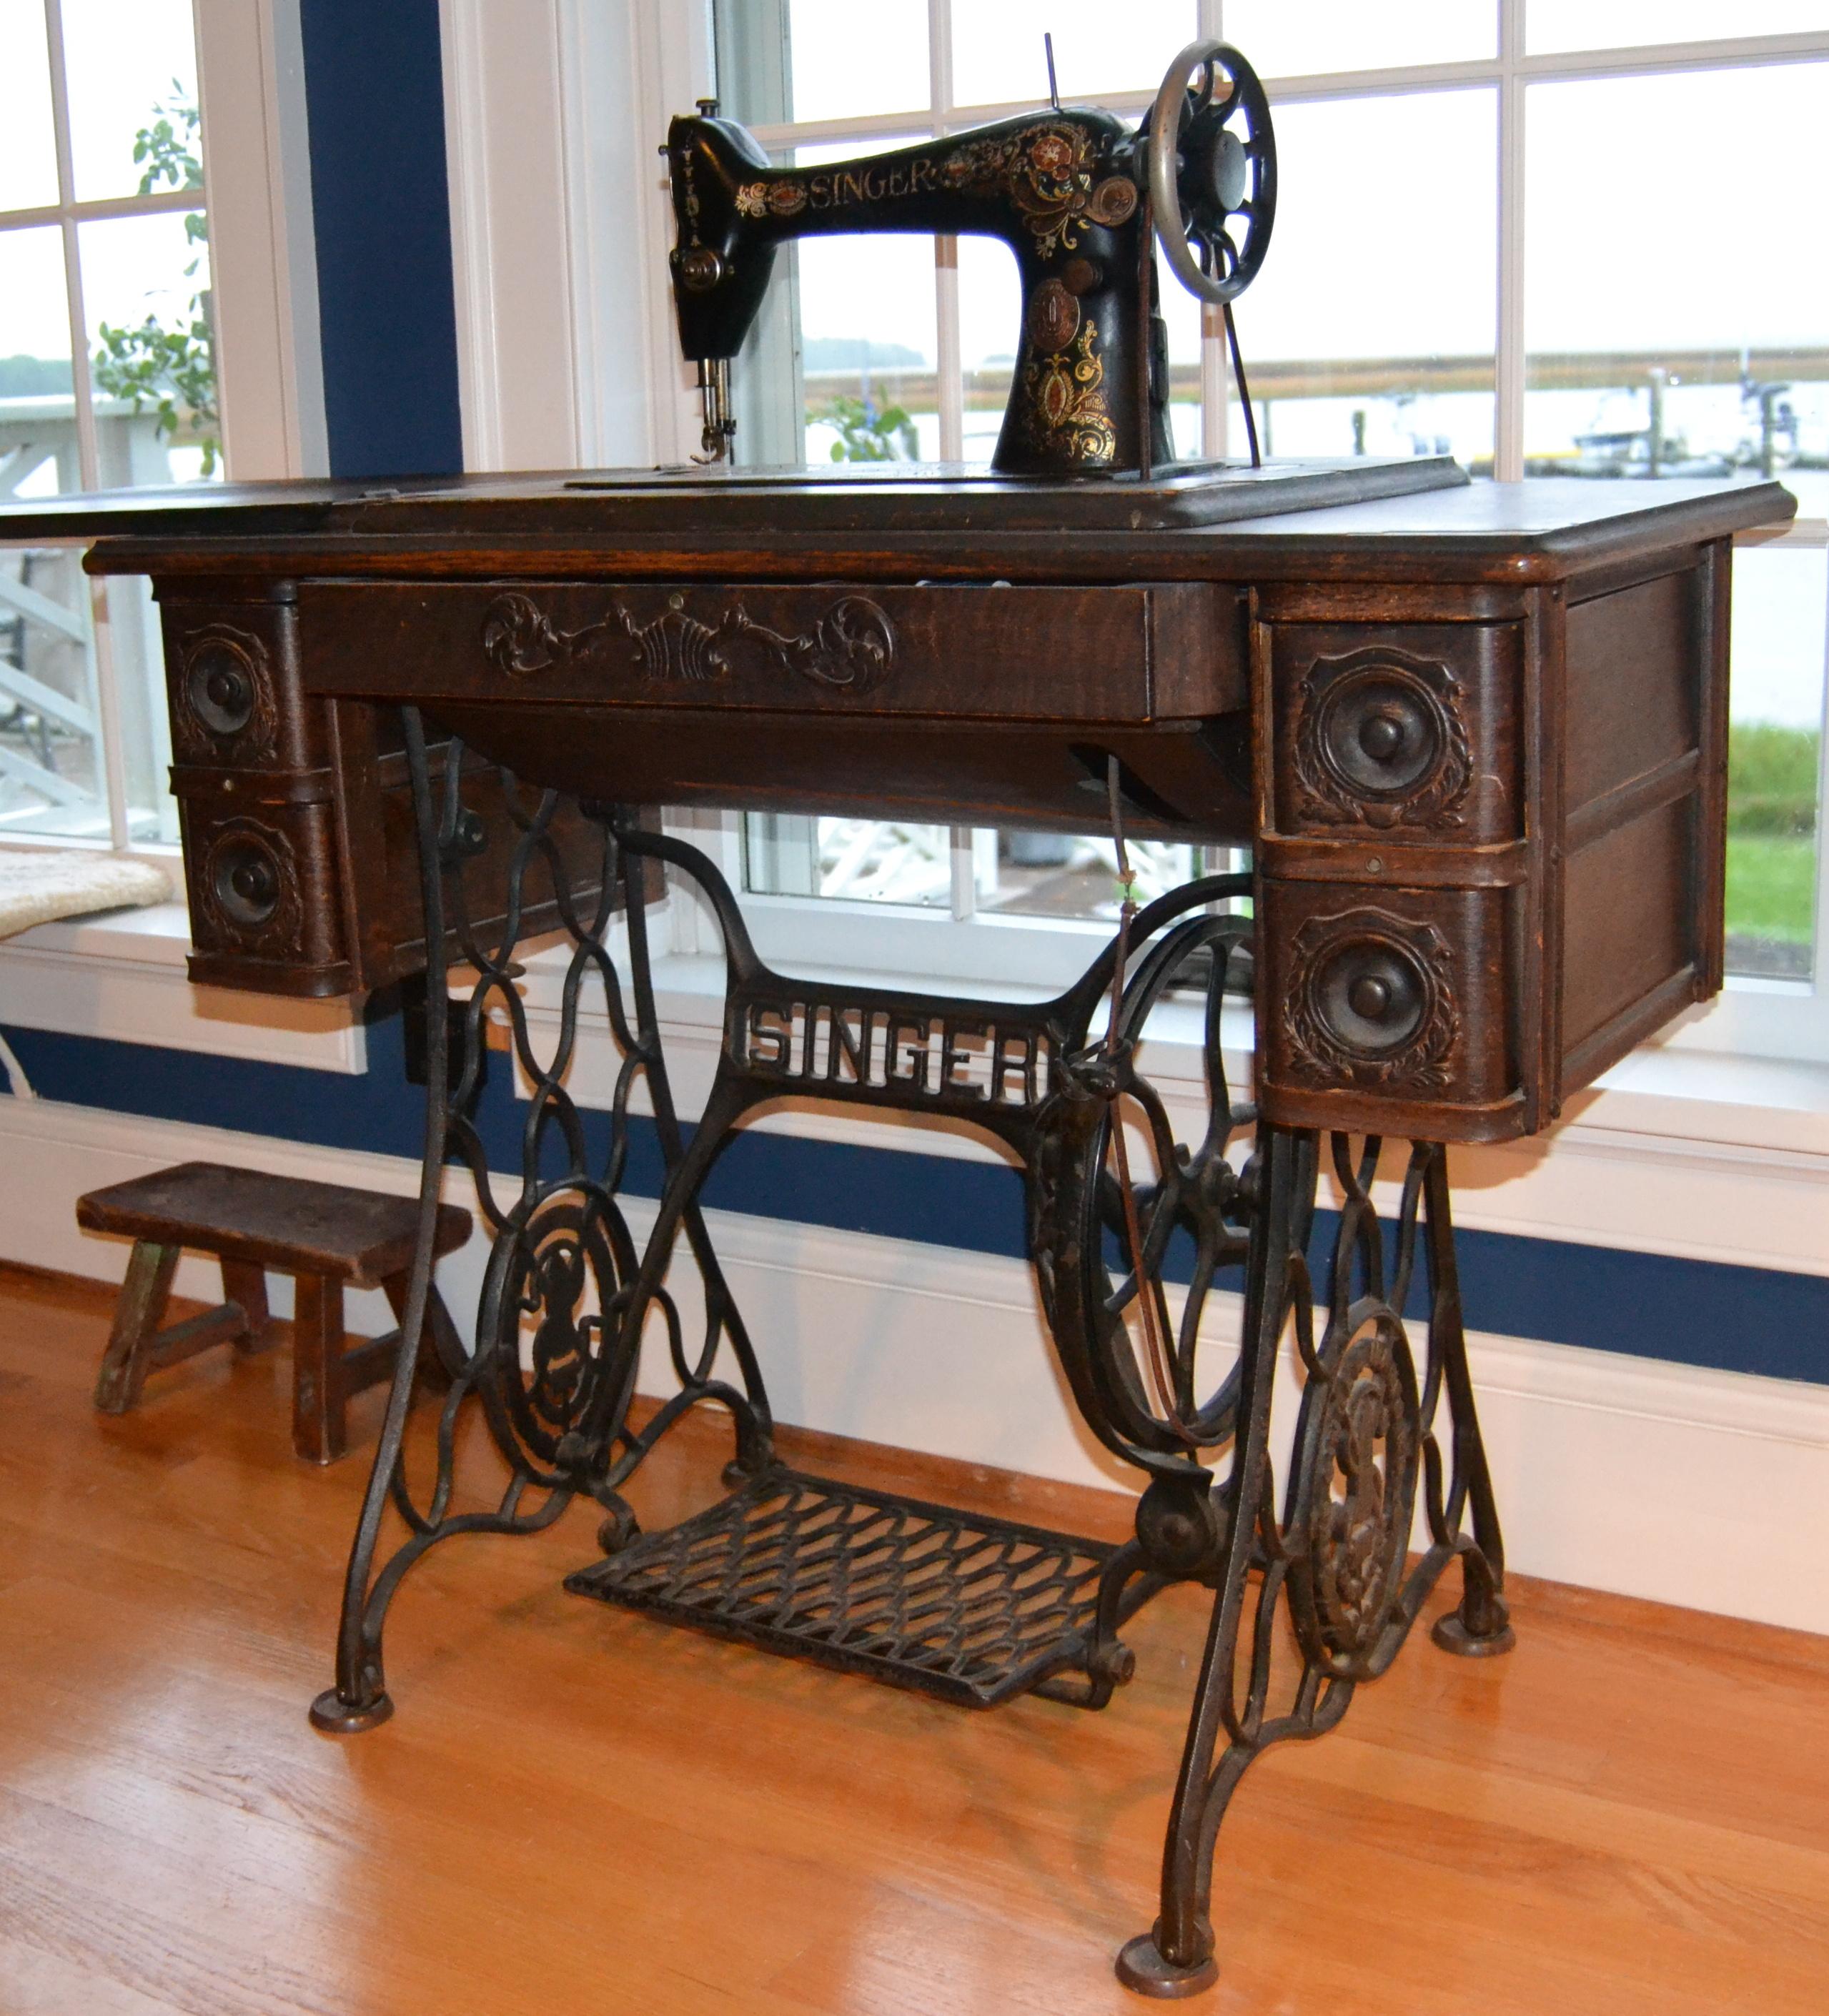 Vintage Singer Sewing Treadle Machine Woodland Decor